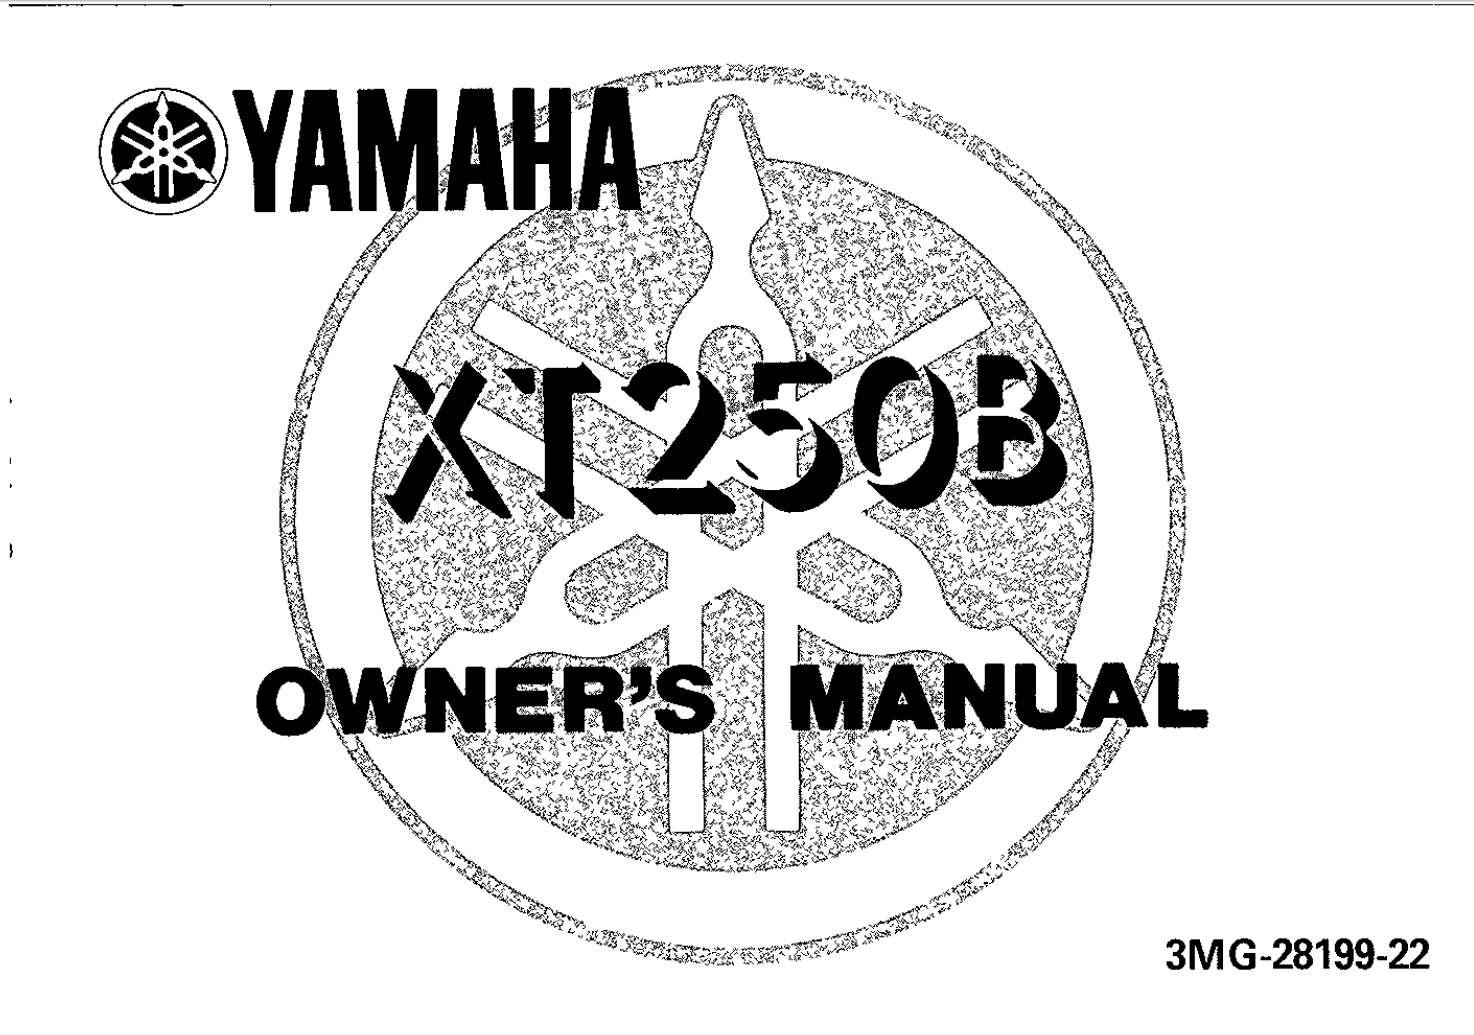 Yamaha XT250 B 1991 Owner's Manual